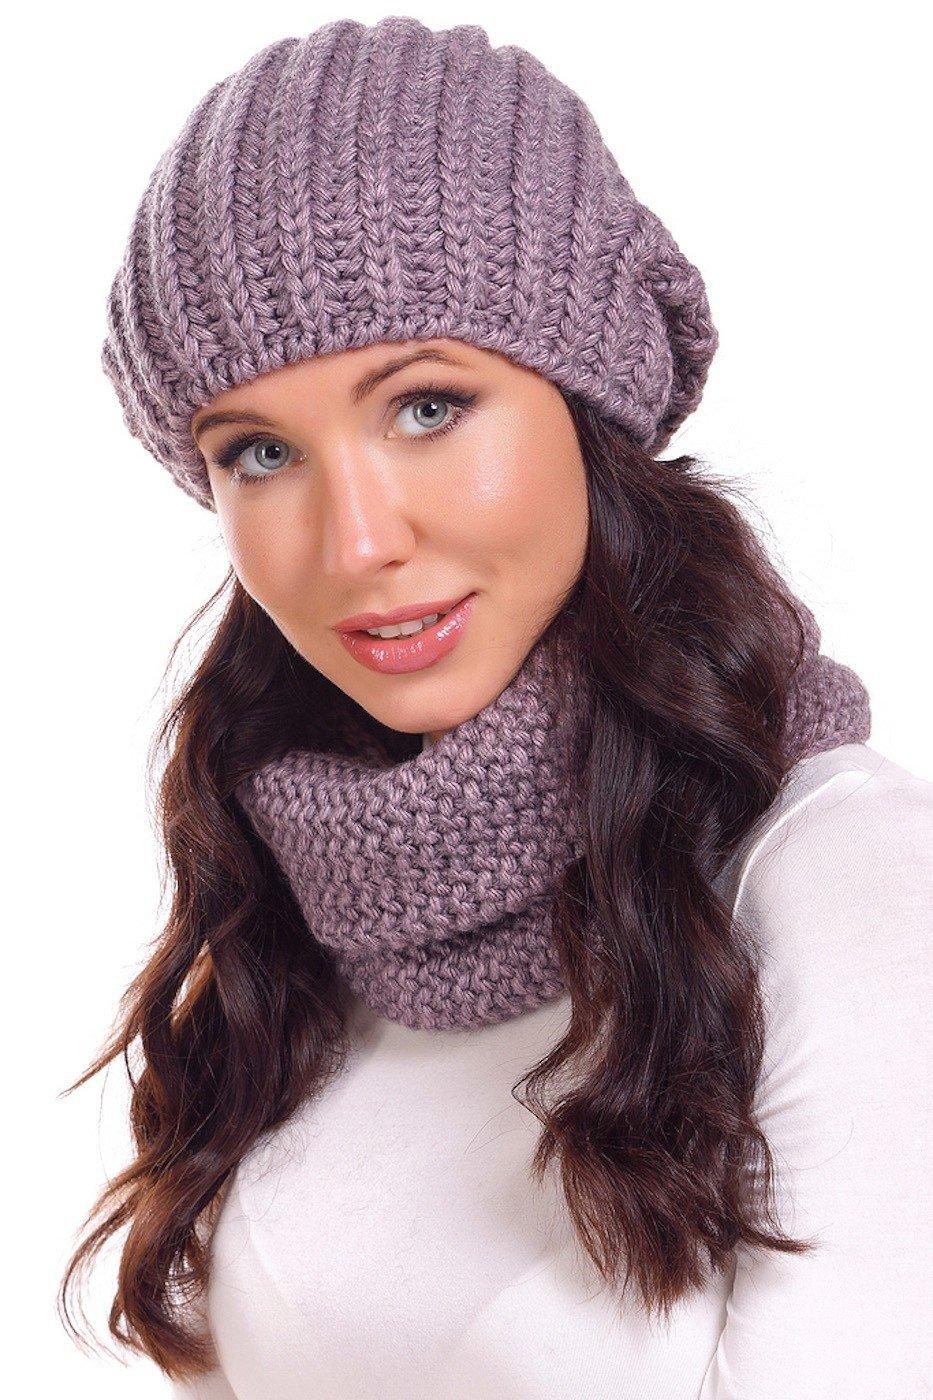 b0e8d10916b Головные уборы осень зима 2019 2020  модная шапка вязаная